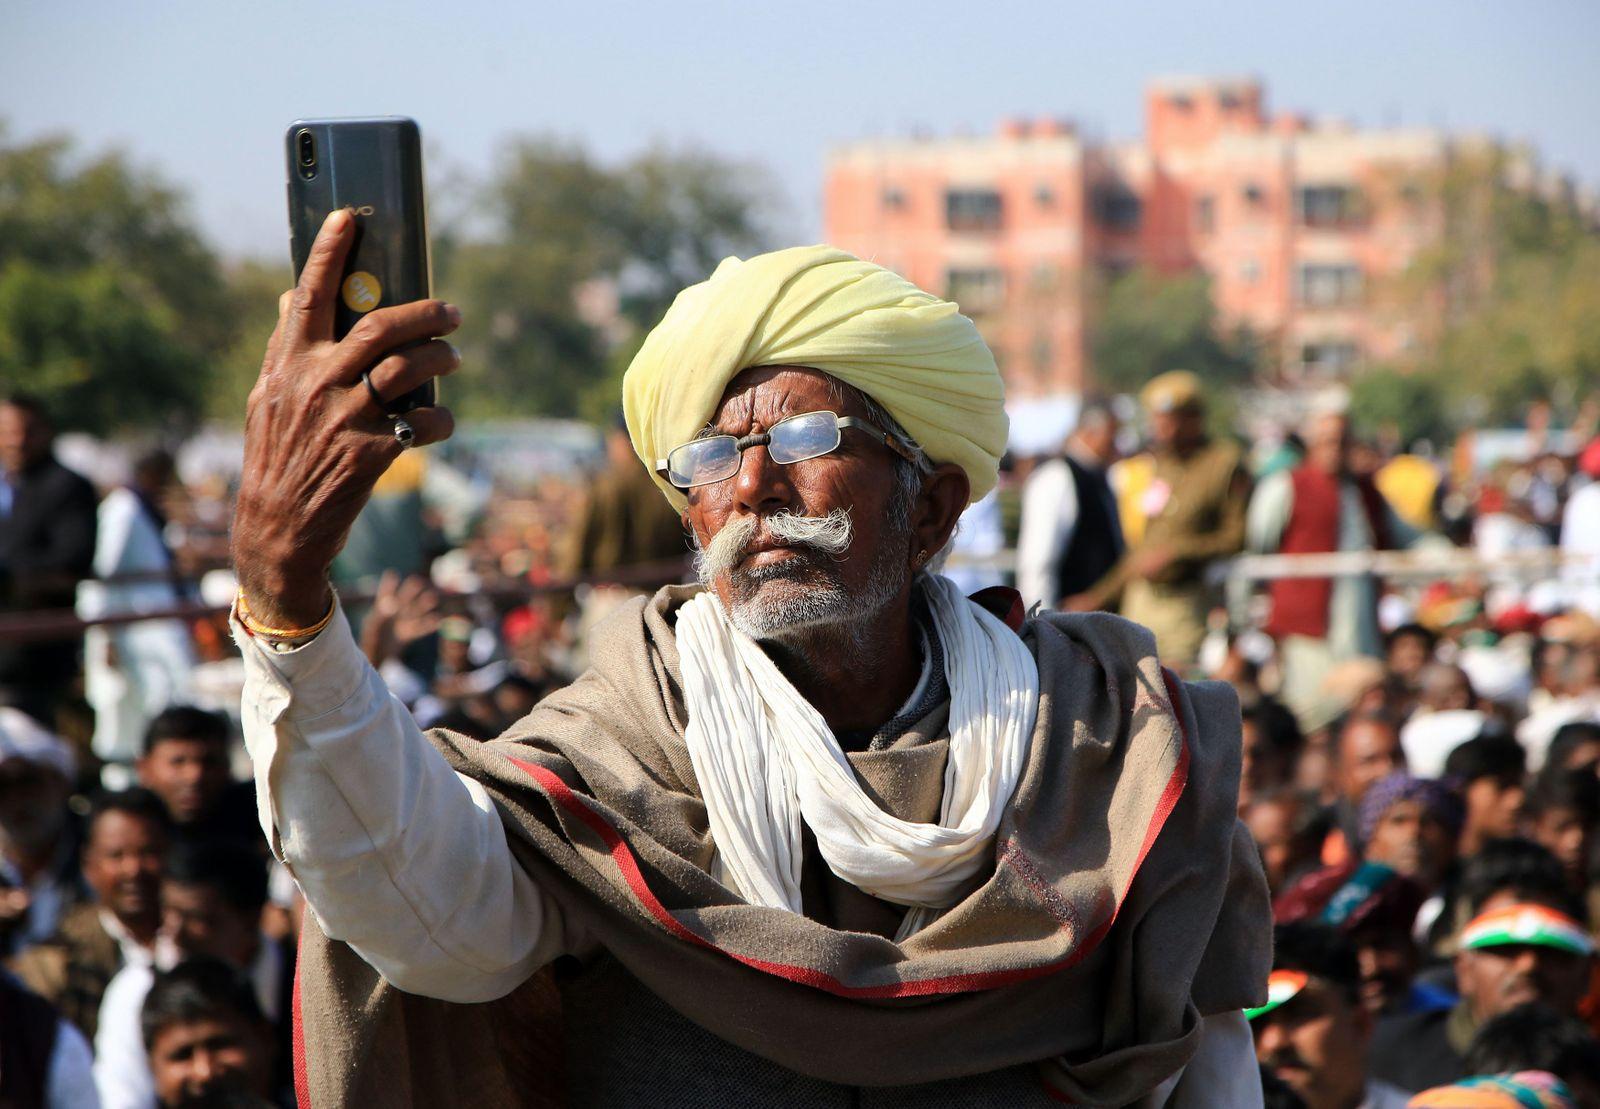 INDIA-POLITICS-PEOPLE-TECHNOLOGY